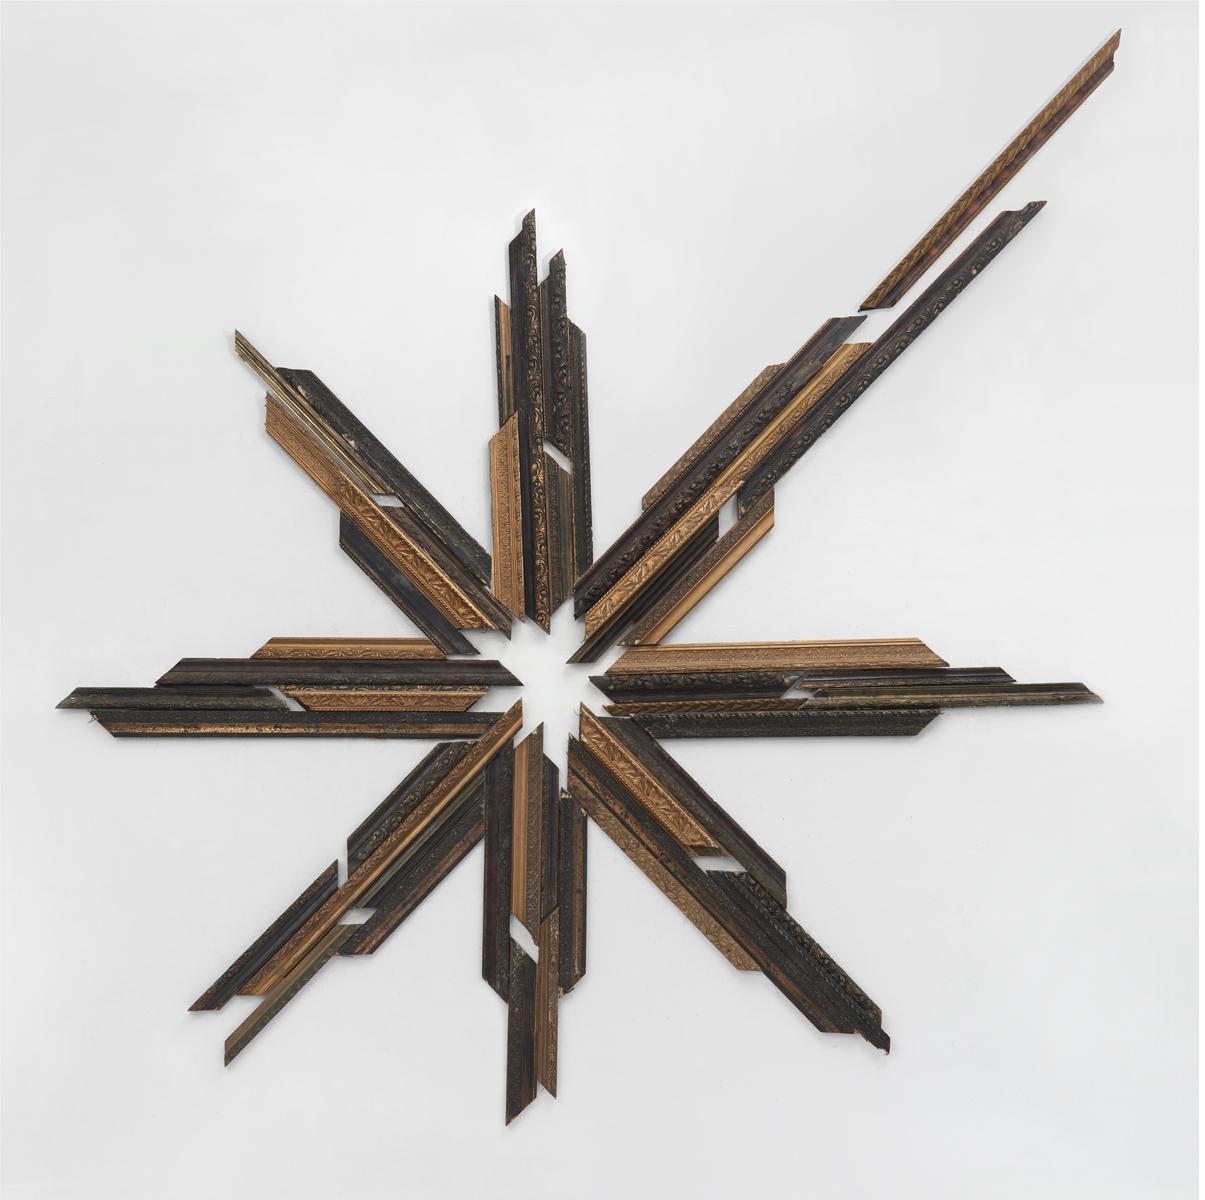 ACTUS PURUS / Radiant / 2016 / 338 x 430 x 7 cm / old frames pieces, nails